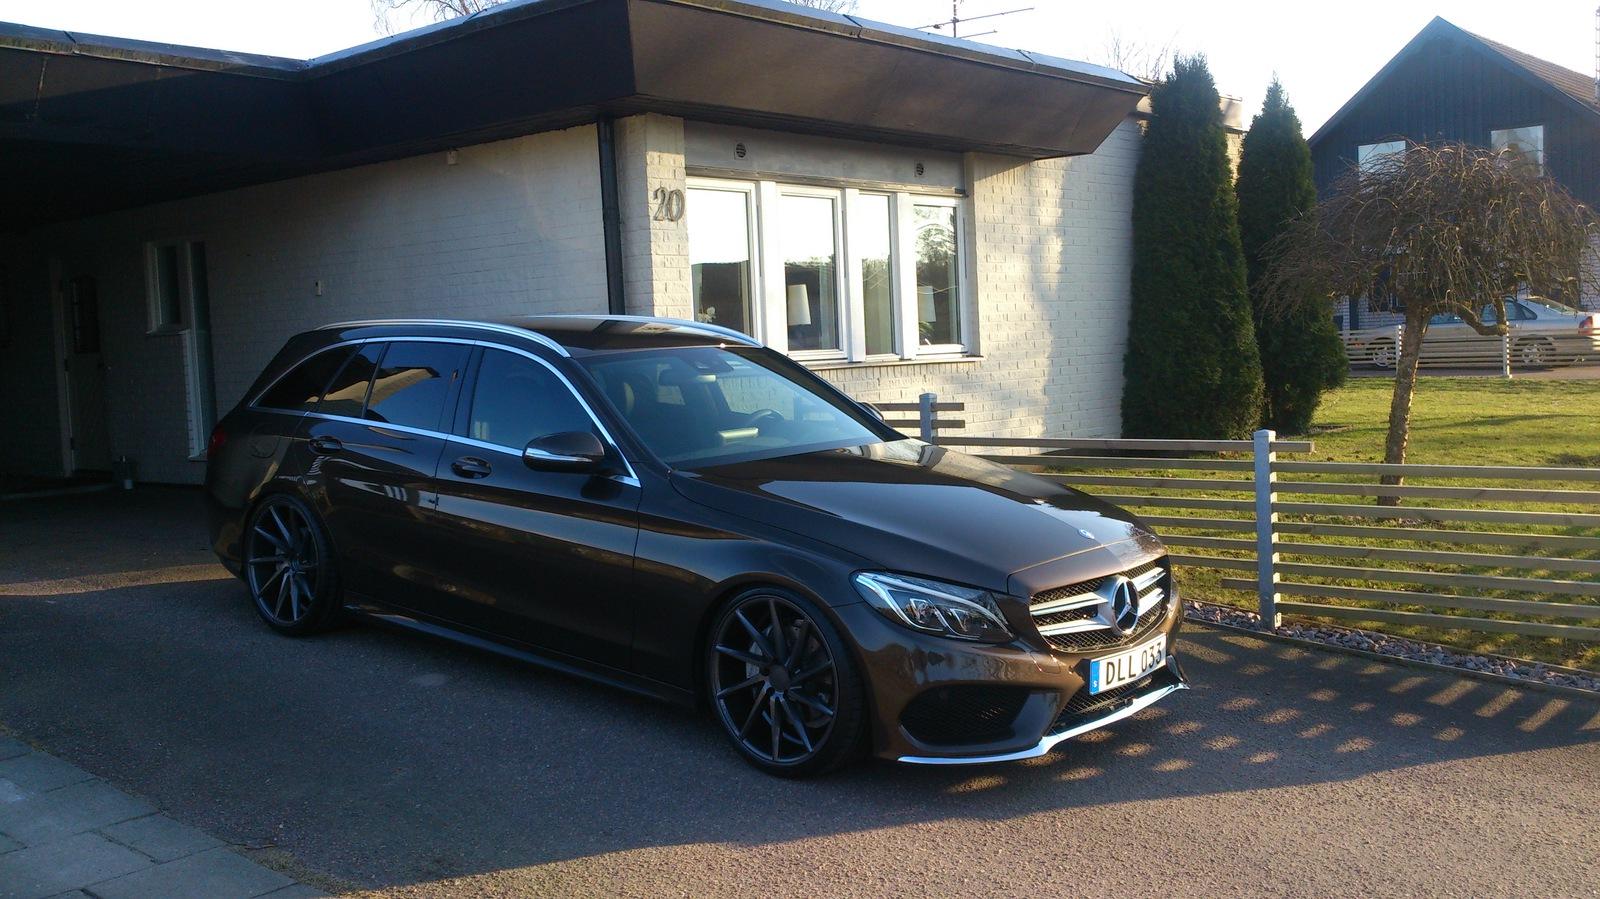 Mercedes benz s205 on r20 vossen cvt rims benztuning for 2015 mercedes benz c300 tire size